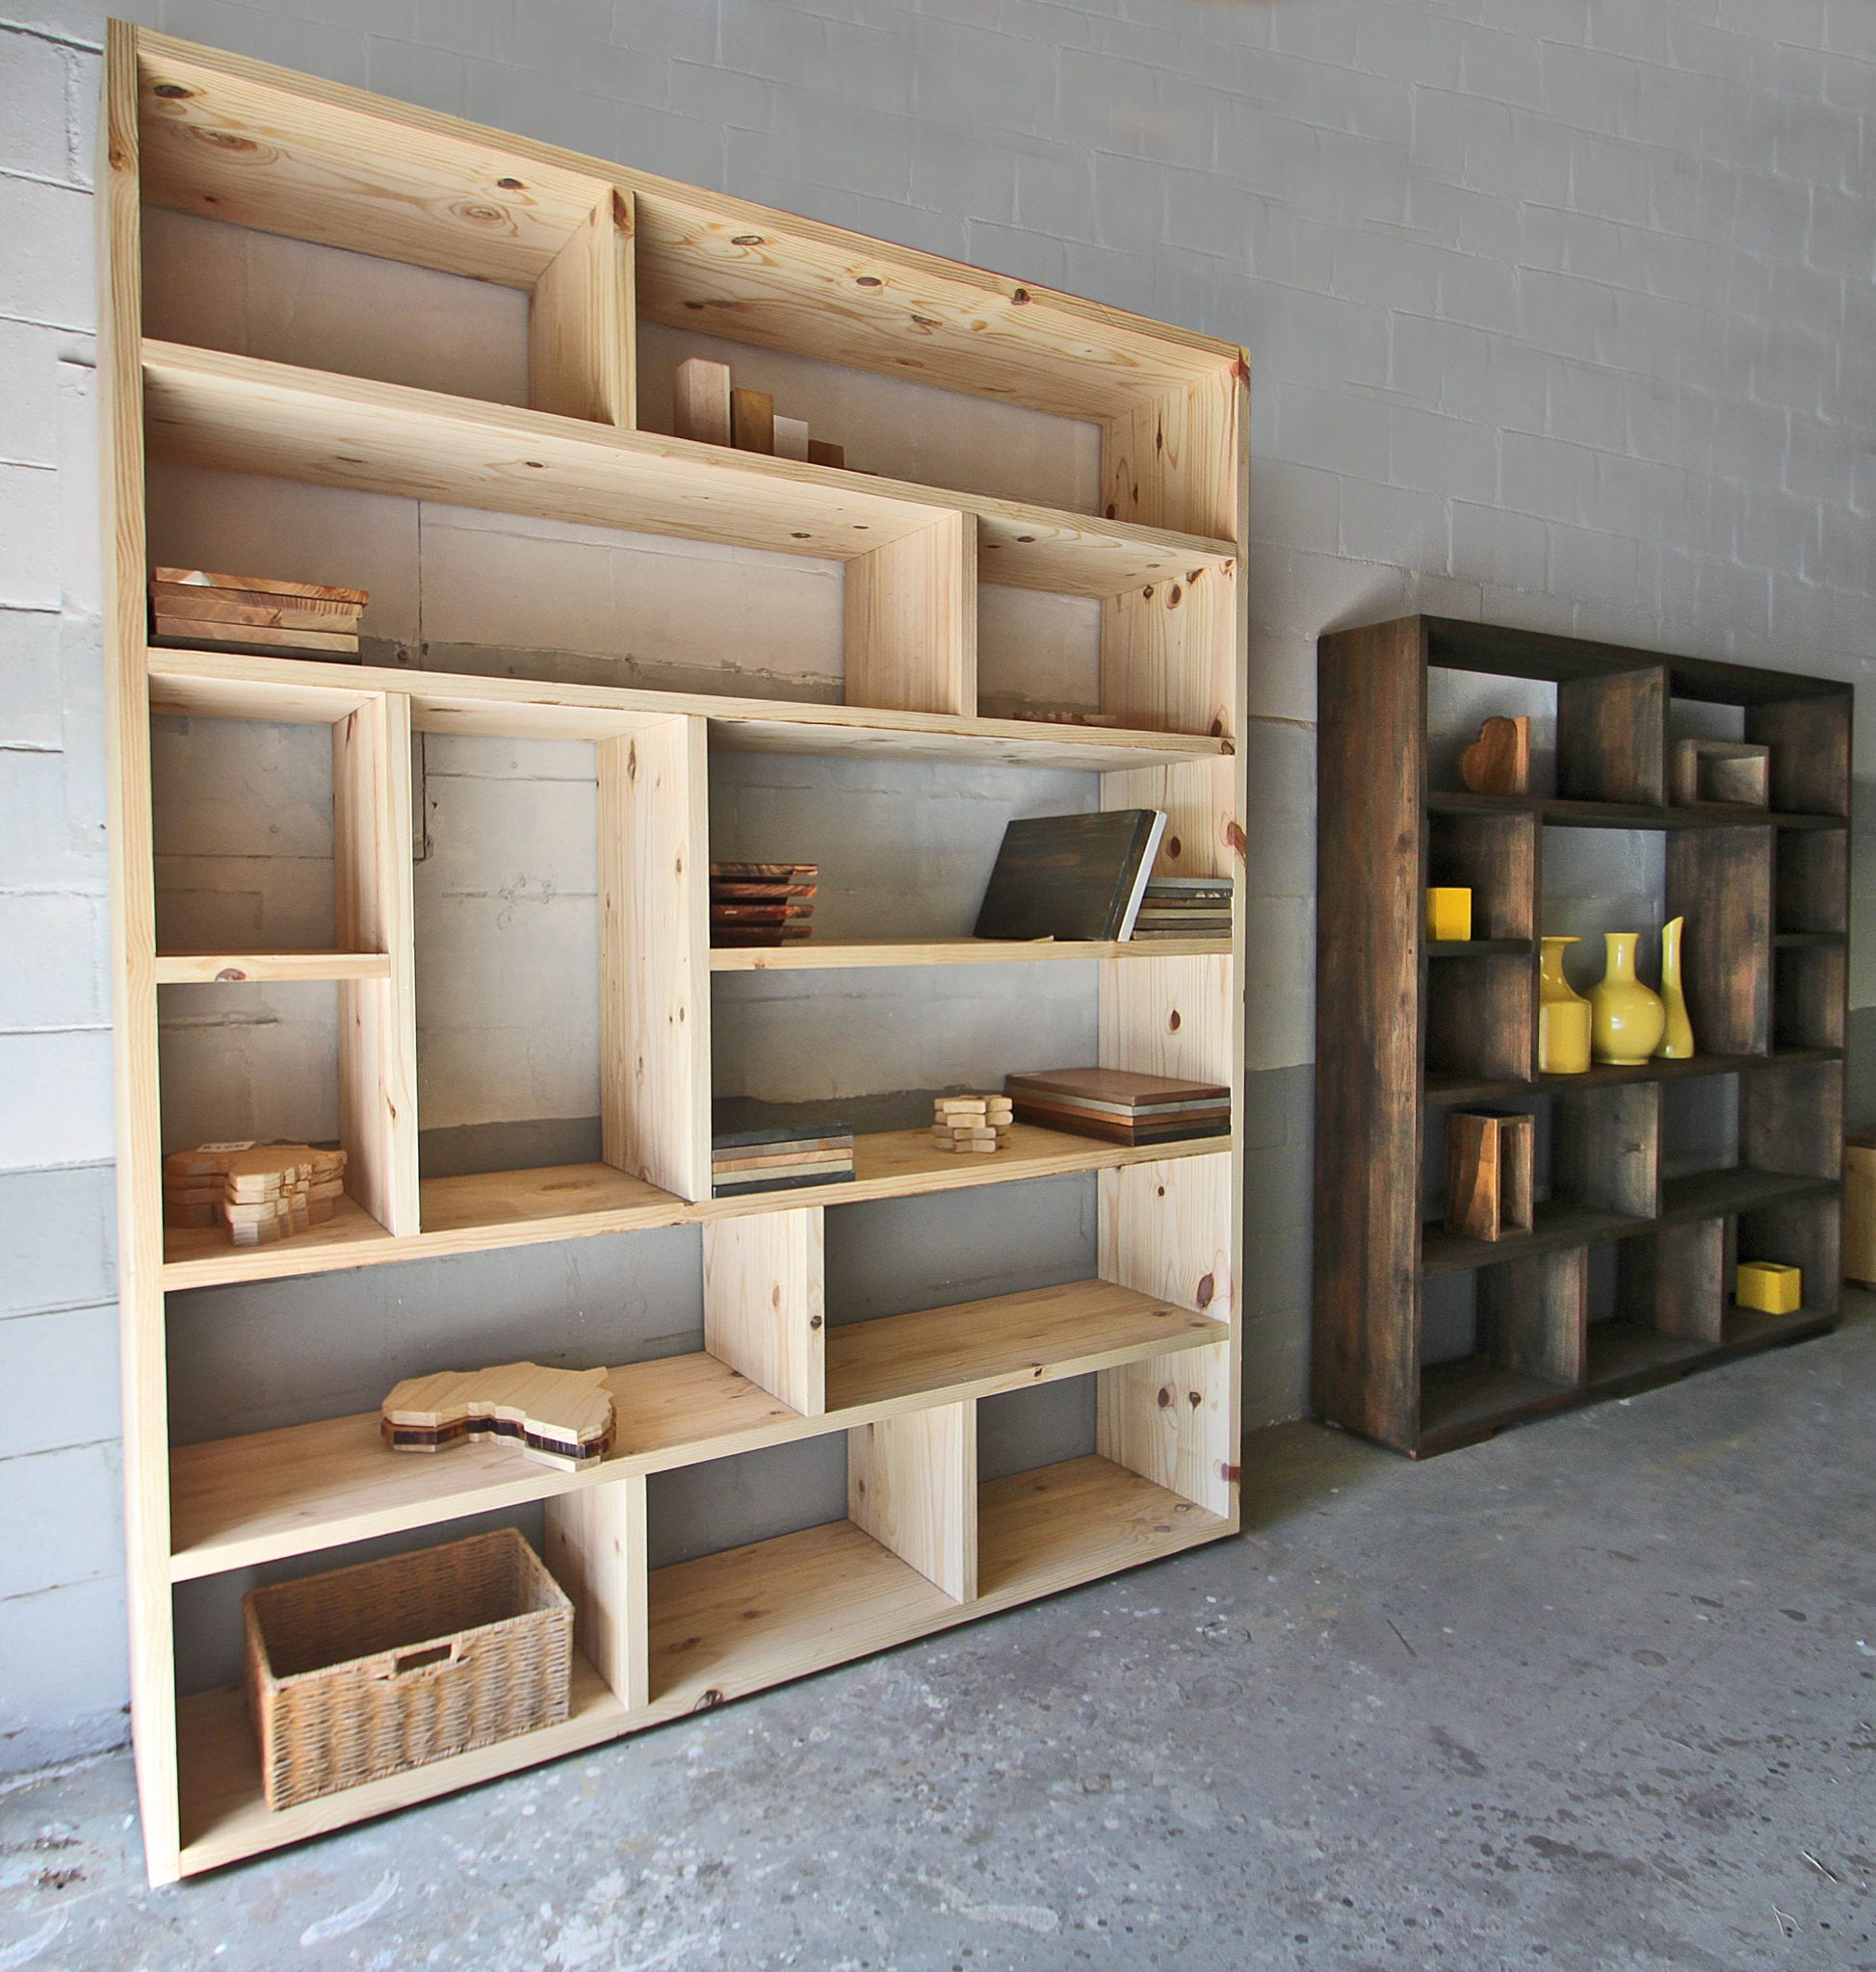 Furniture Shop Cape Town South Africa Furniture Beds